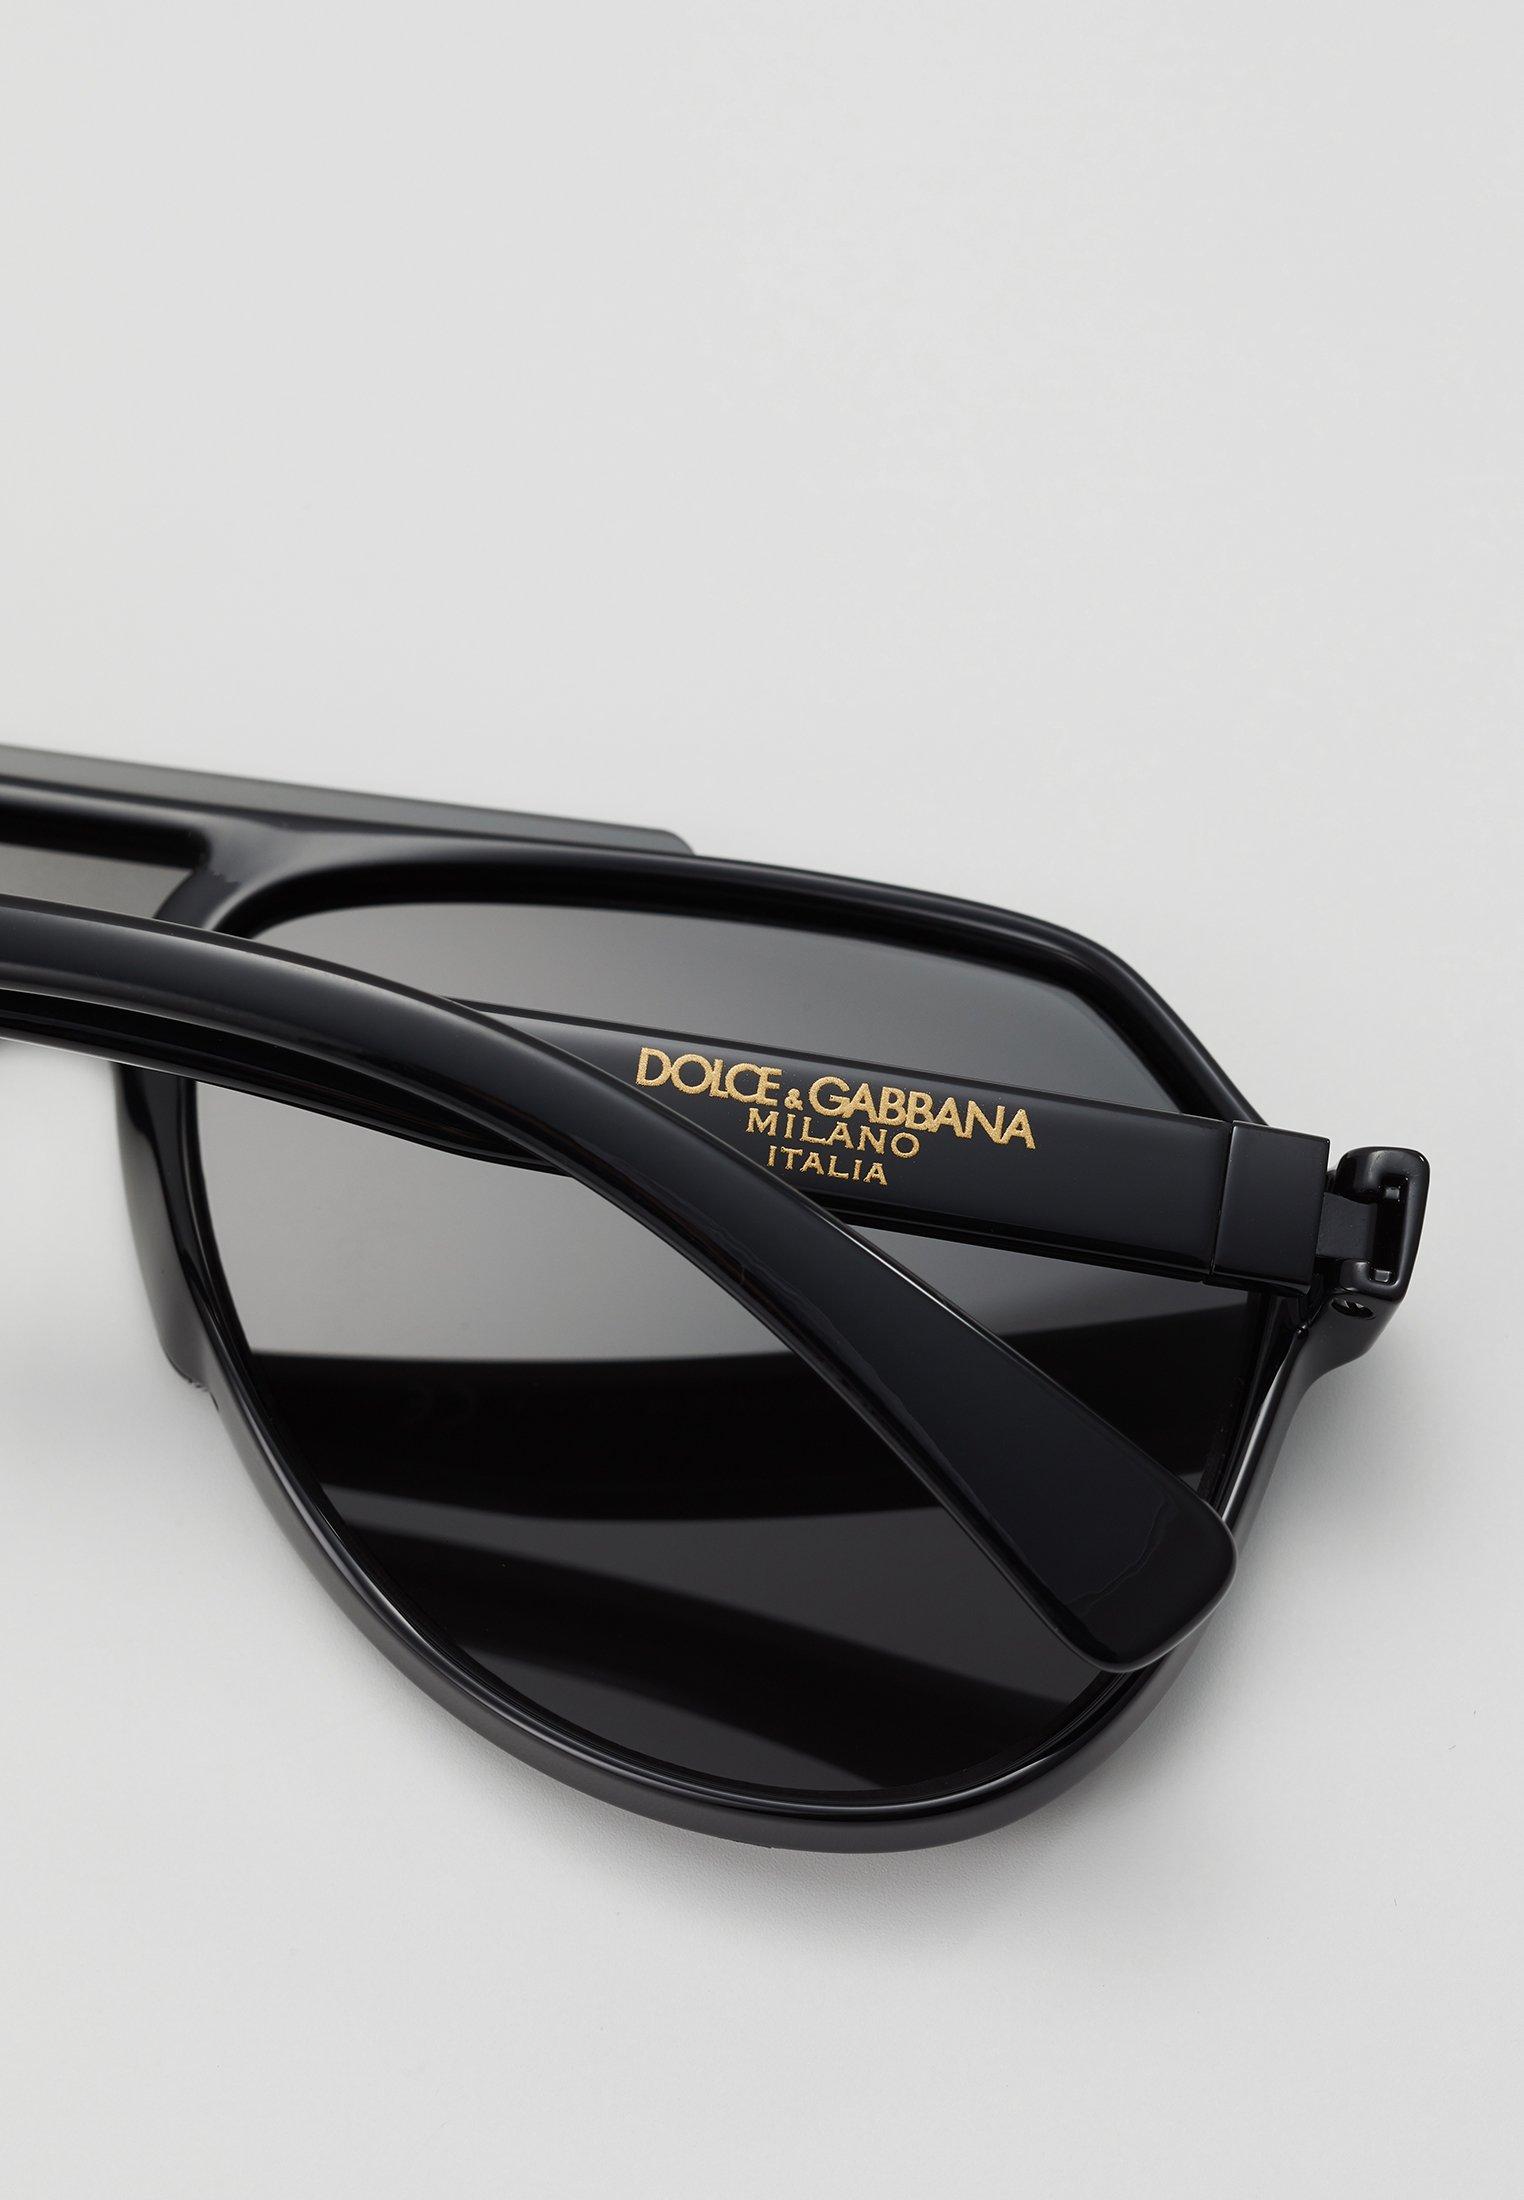 DolceGabbana Sonnenbrille - black/schwarz - Herrenaccessoires tz05g